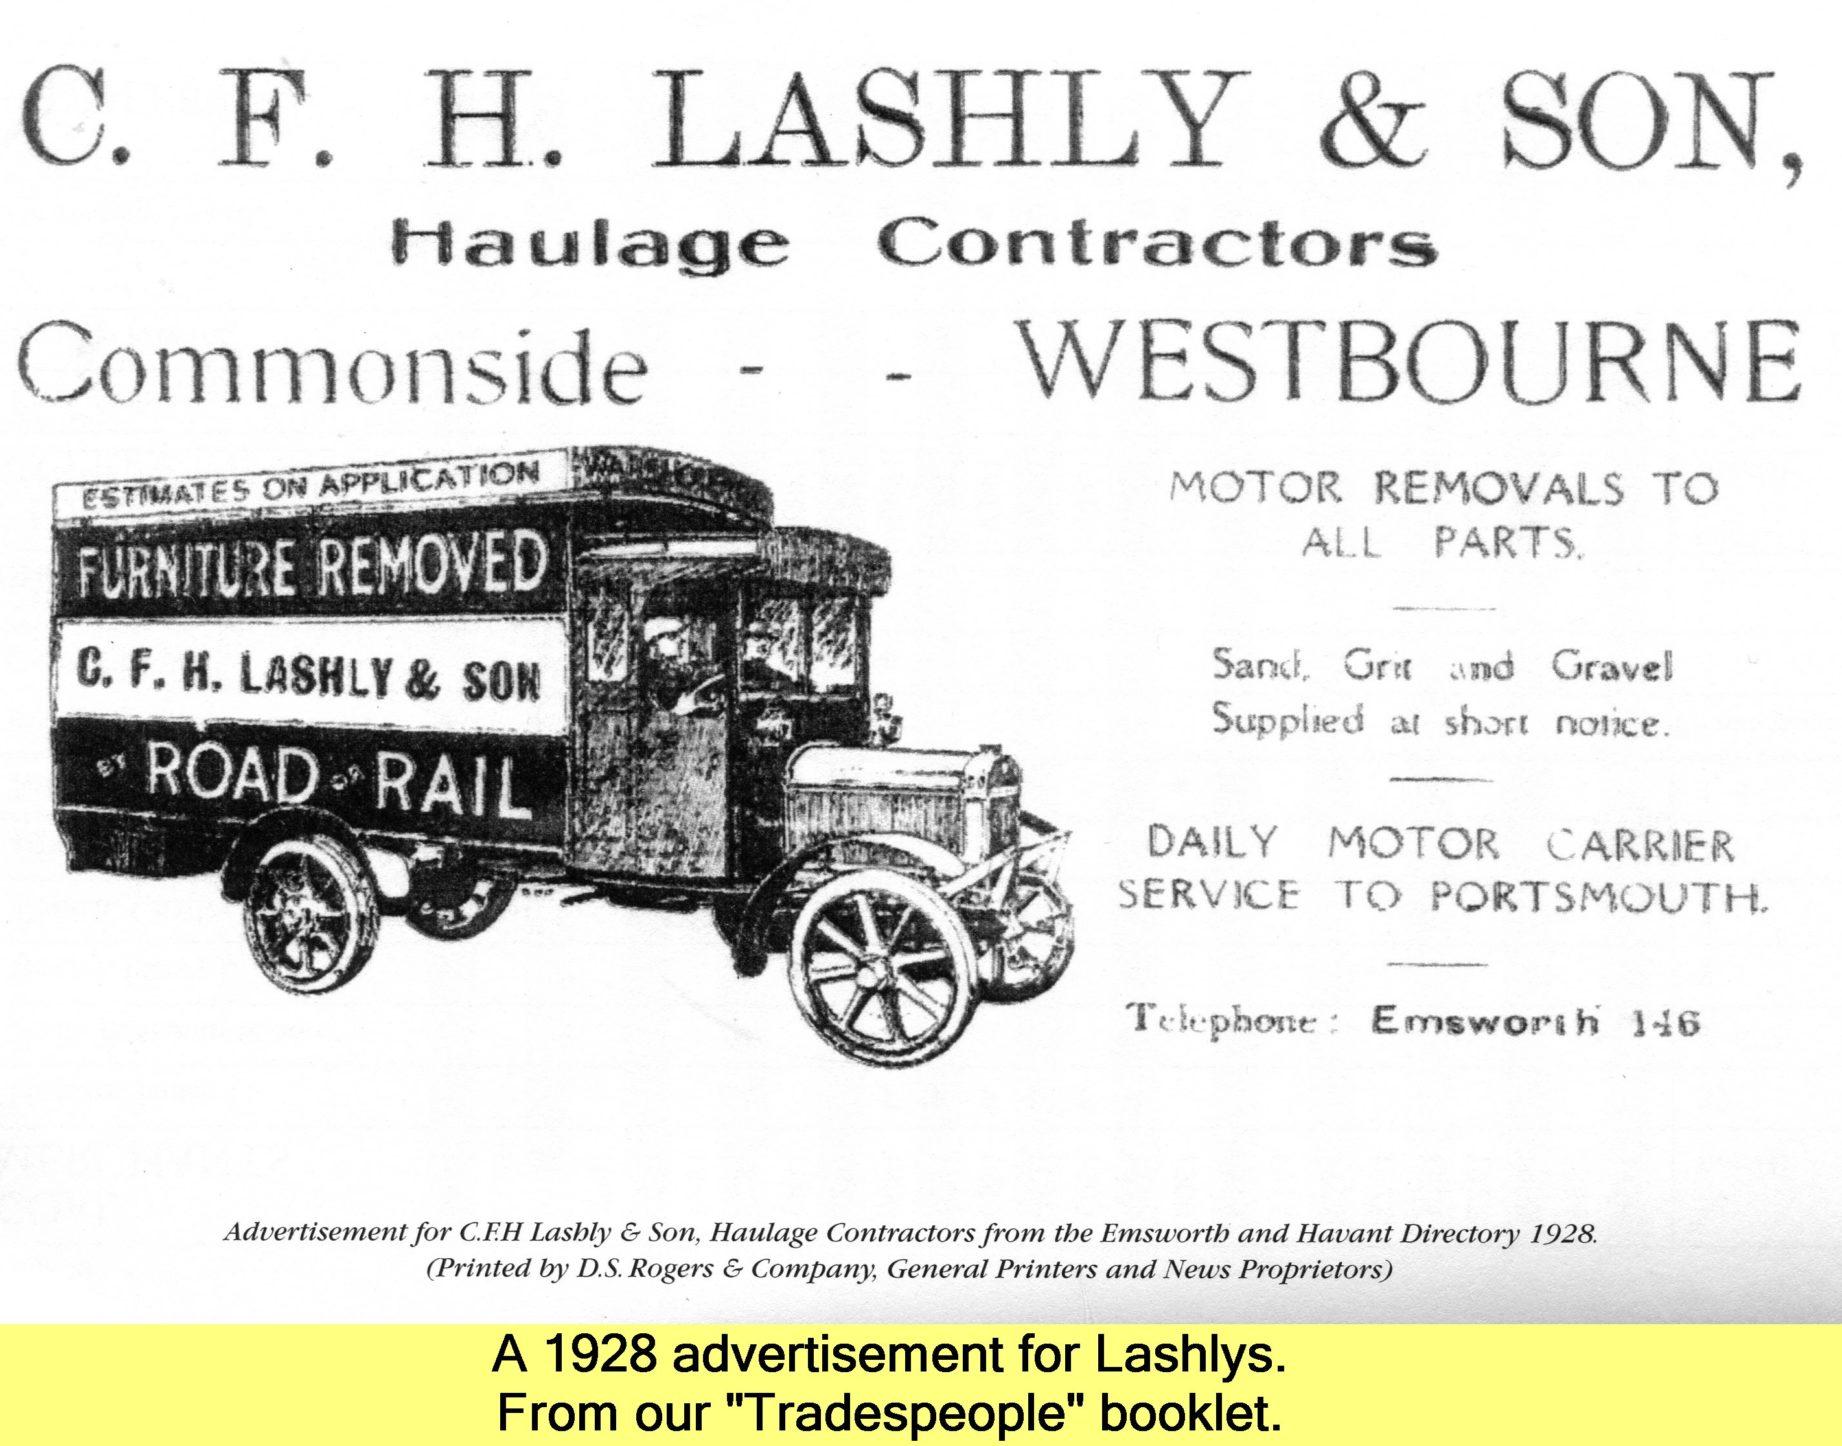 WESTBOURNE HISTORY PHOTO, LASHLY, HAULIER, ADVERT, 1928, TRADESPEOPLE